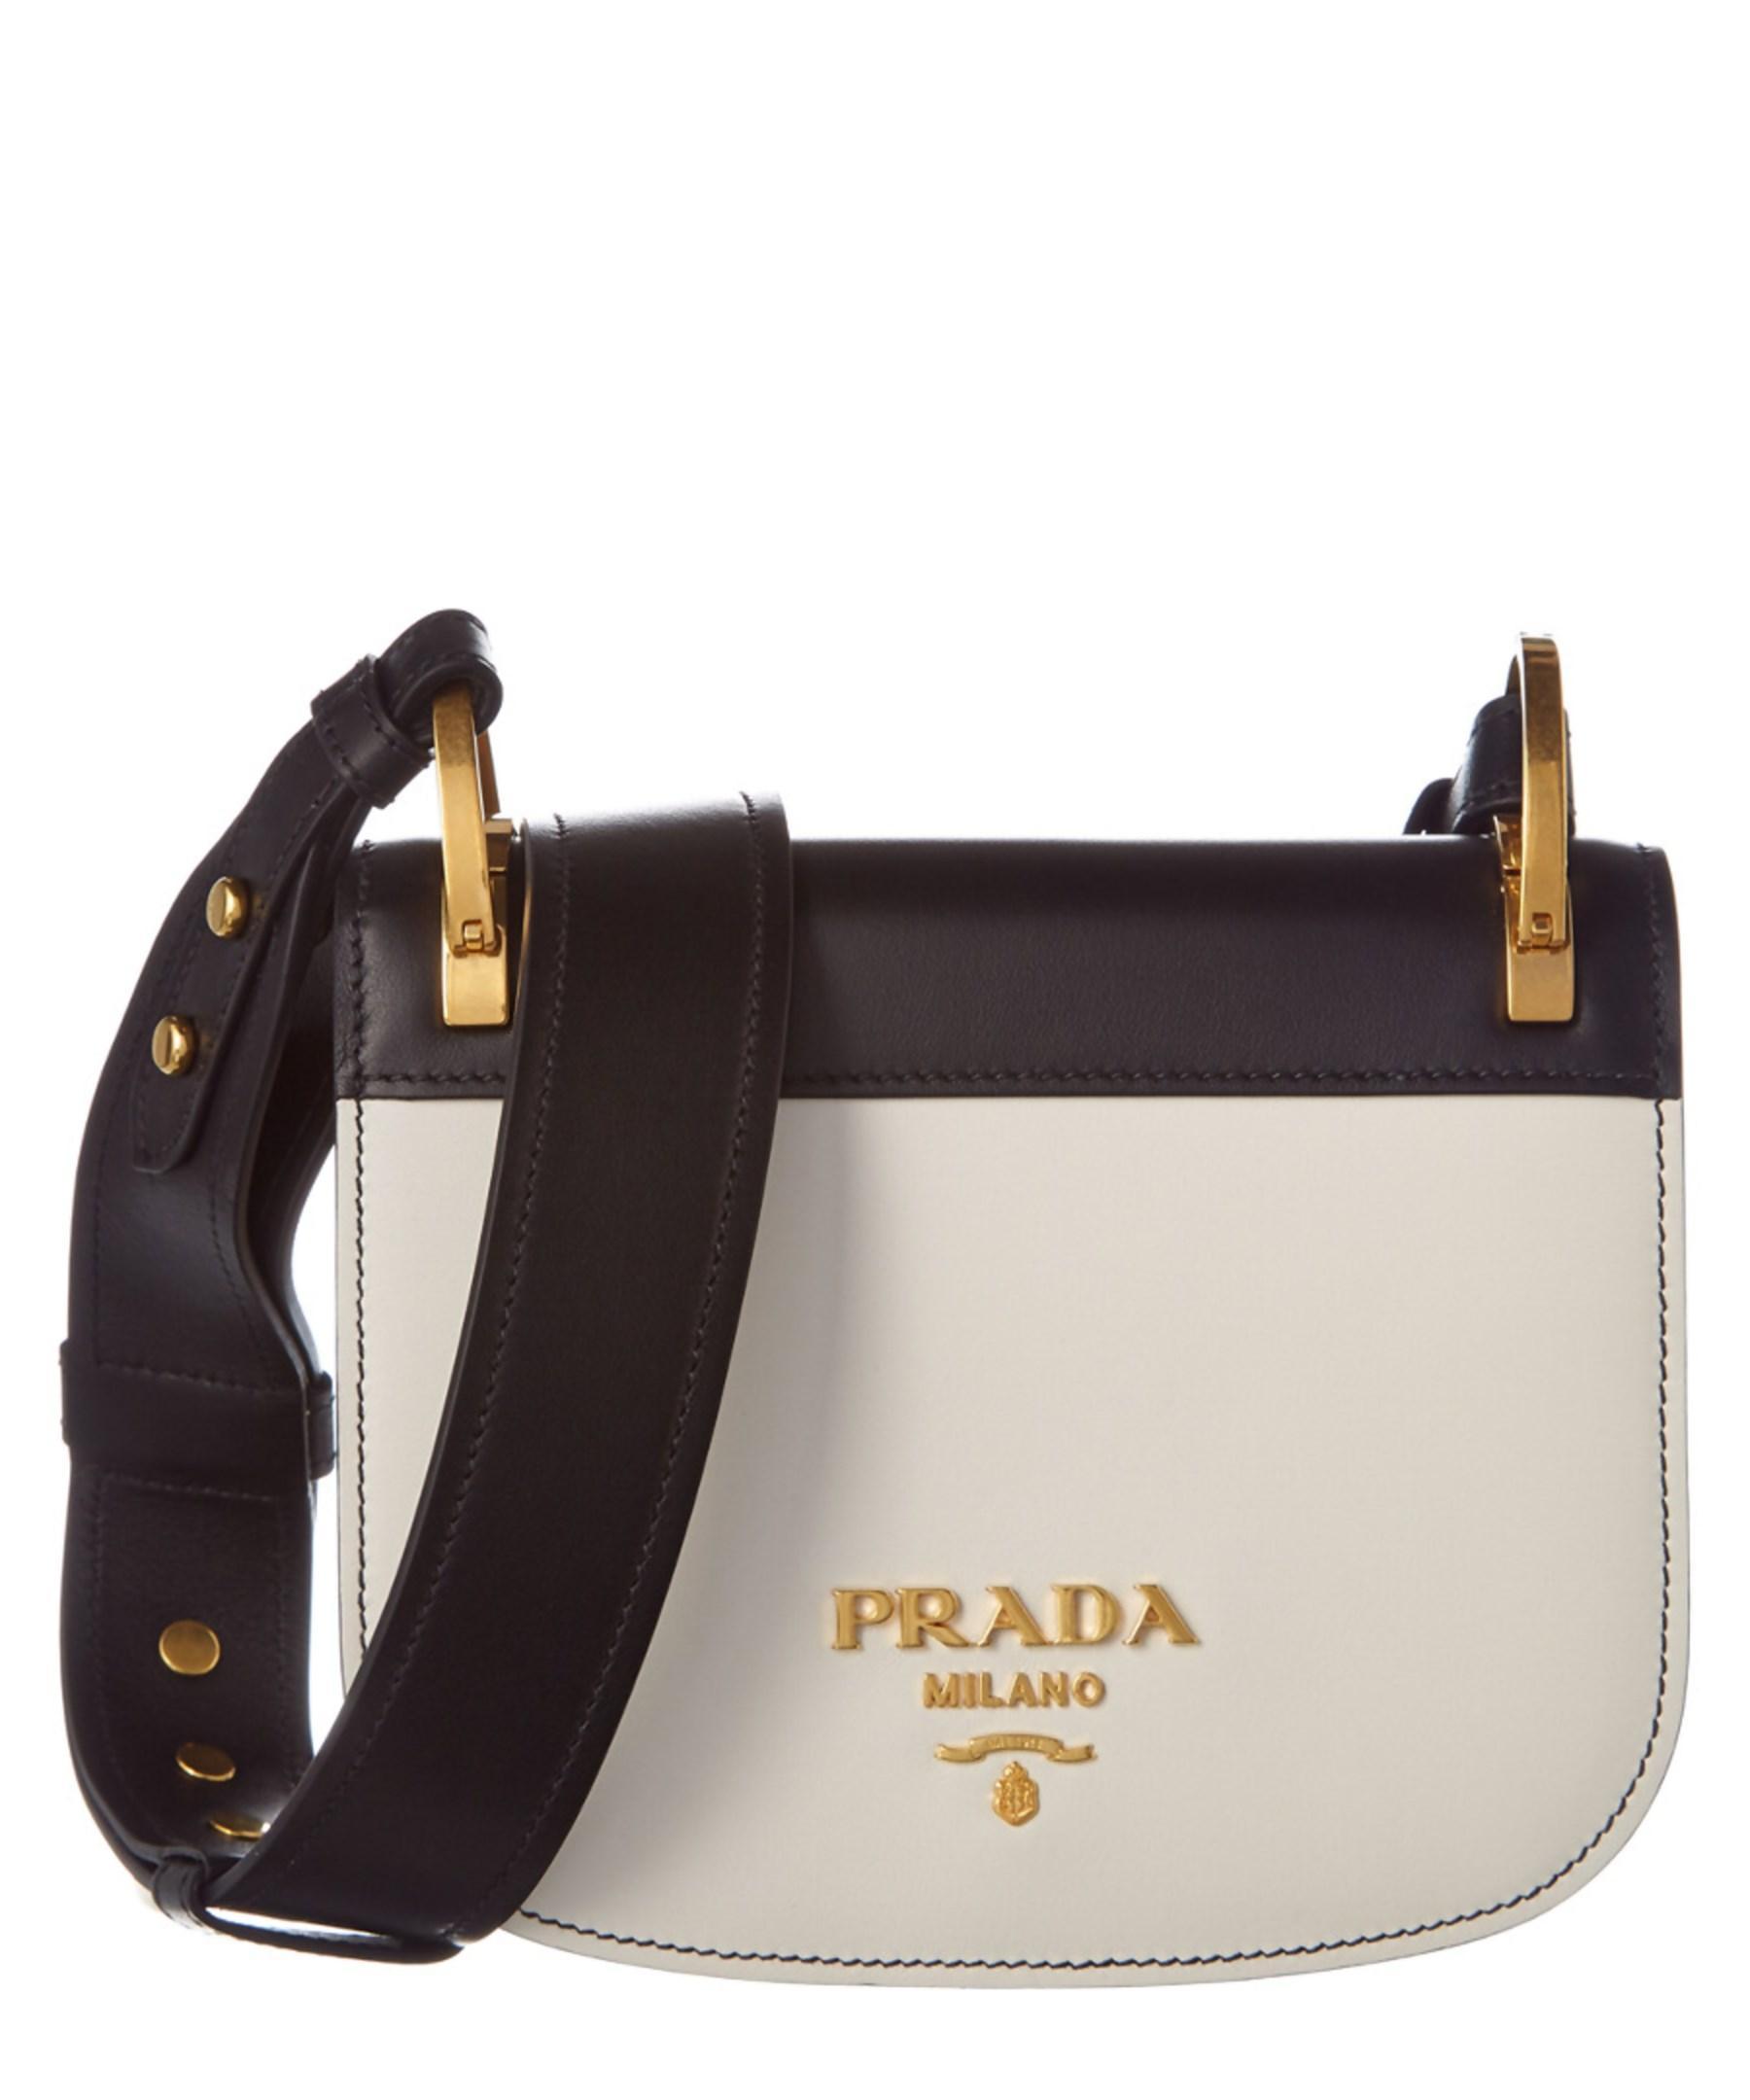 c6f5187f6c41a2 ... italy lyst prada pionniere calf leather saddle bag in white 0dc97 30af3